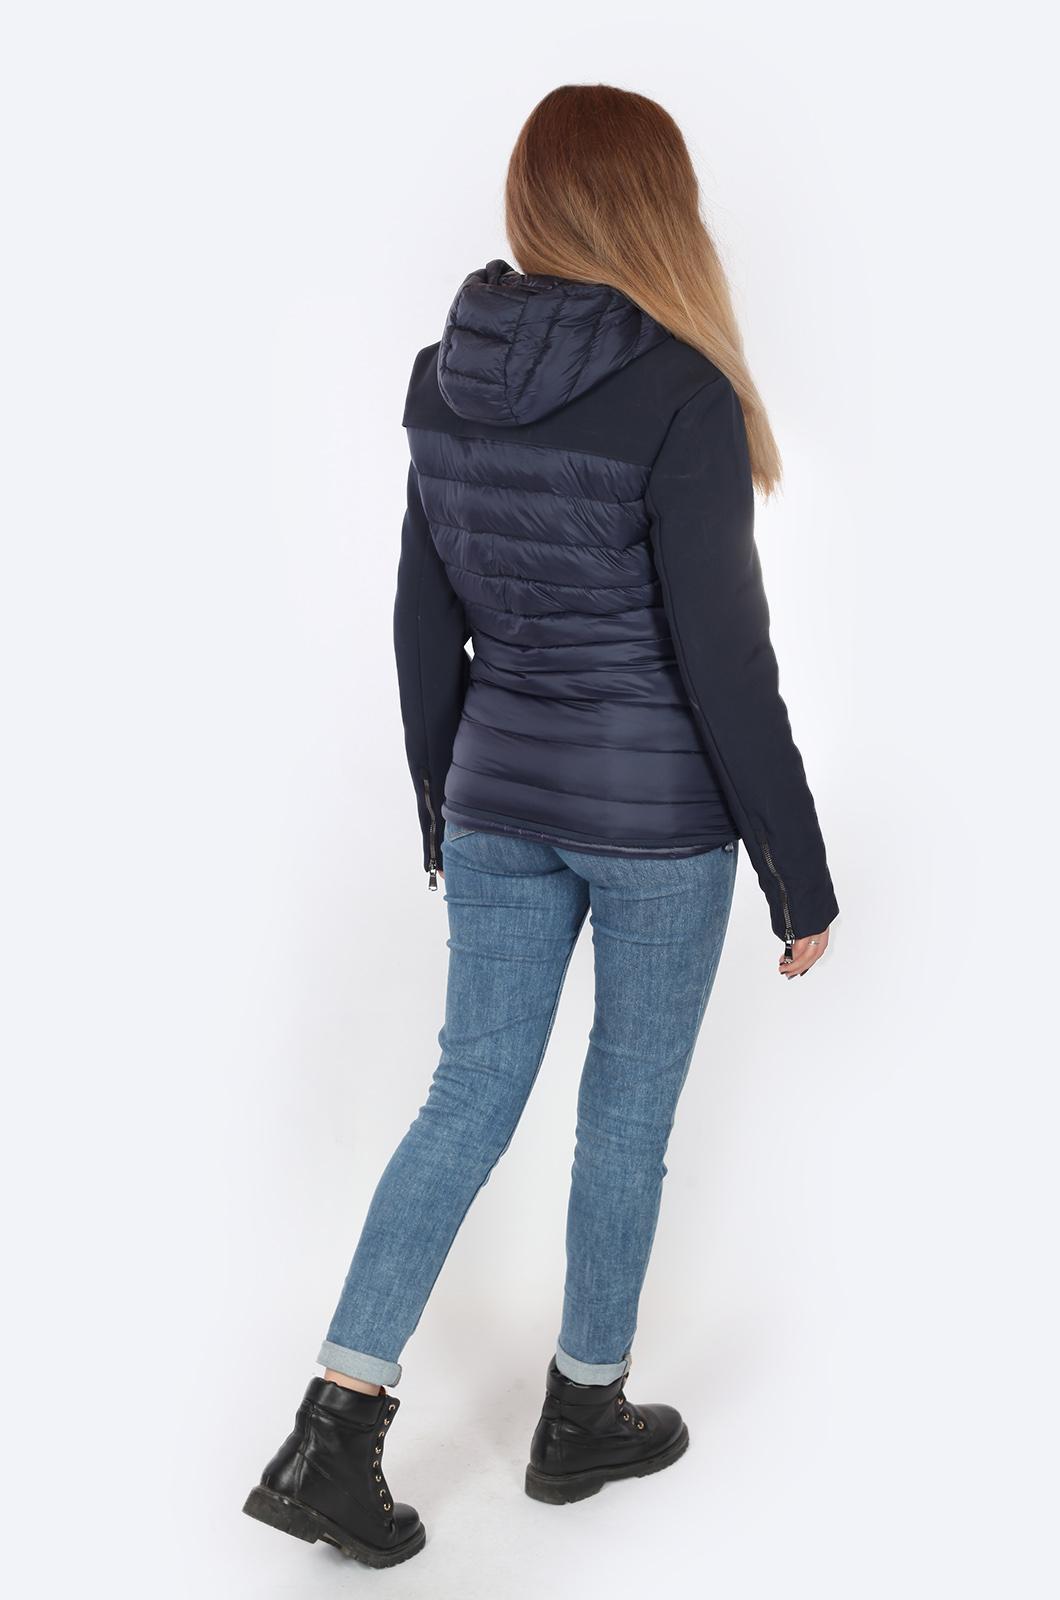 Легкая, но теплая куртка на осень-зиму